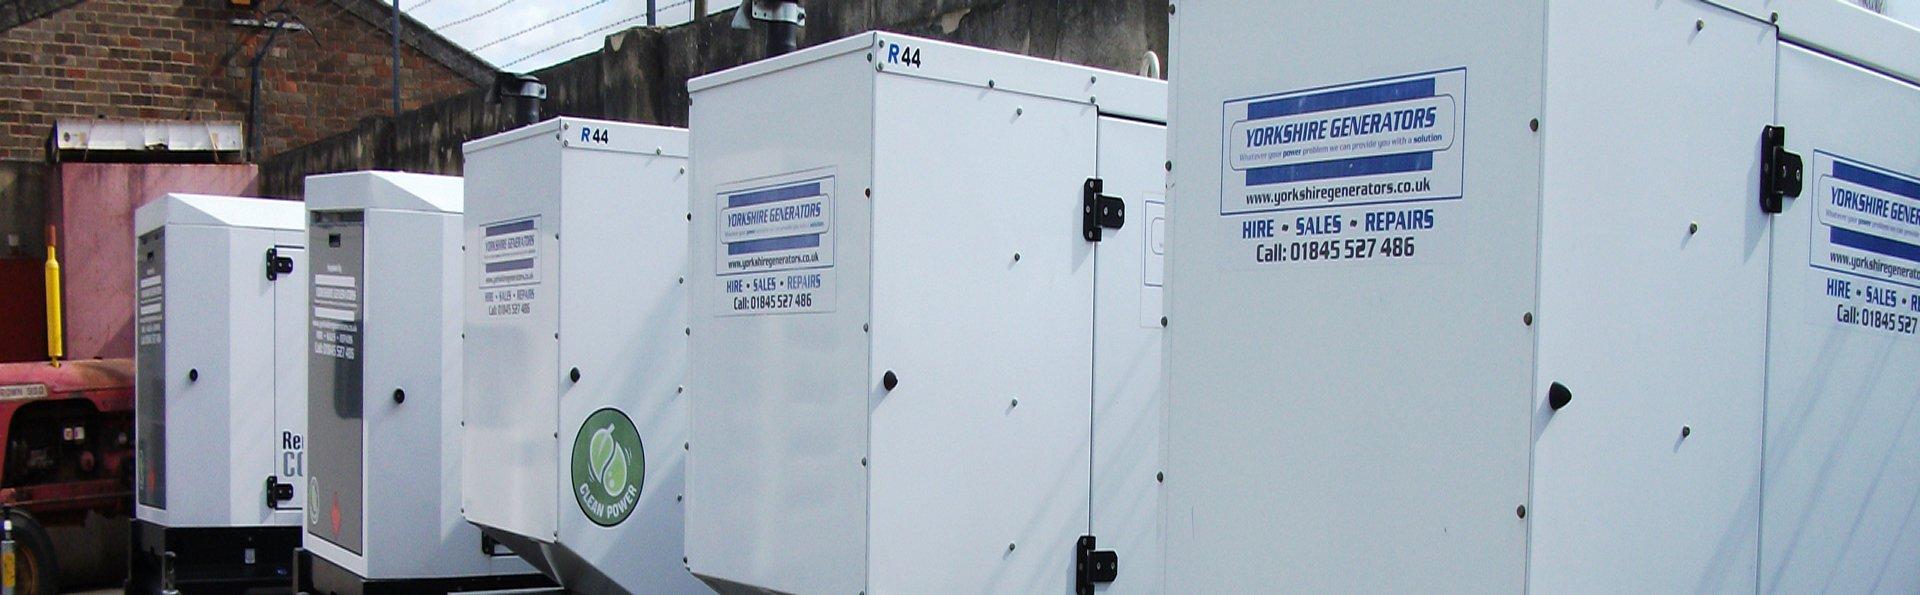 Yorkshire Generators, Unbeatable Prices, Friendly Service